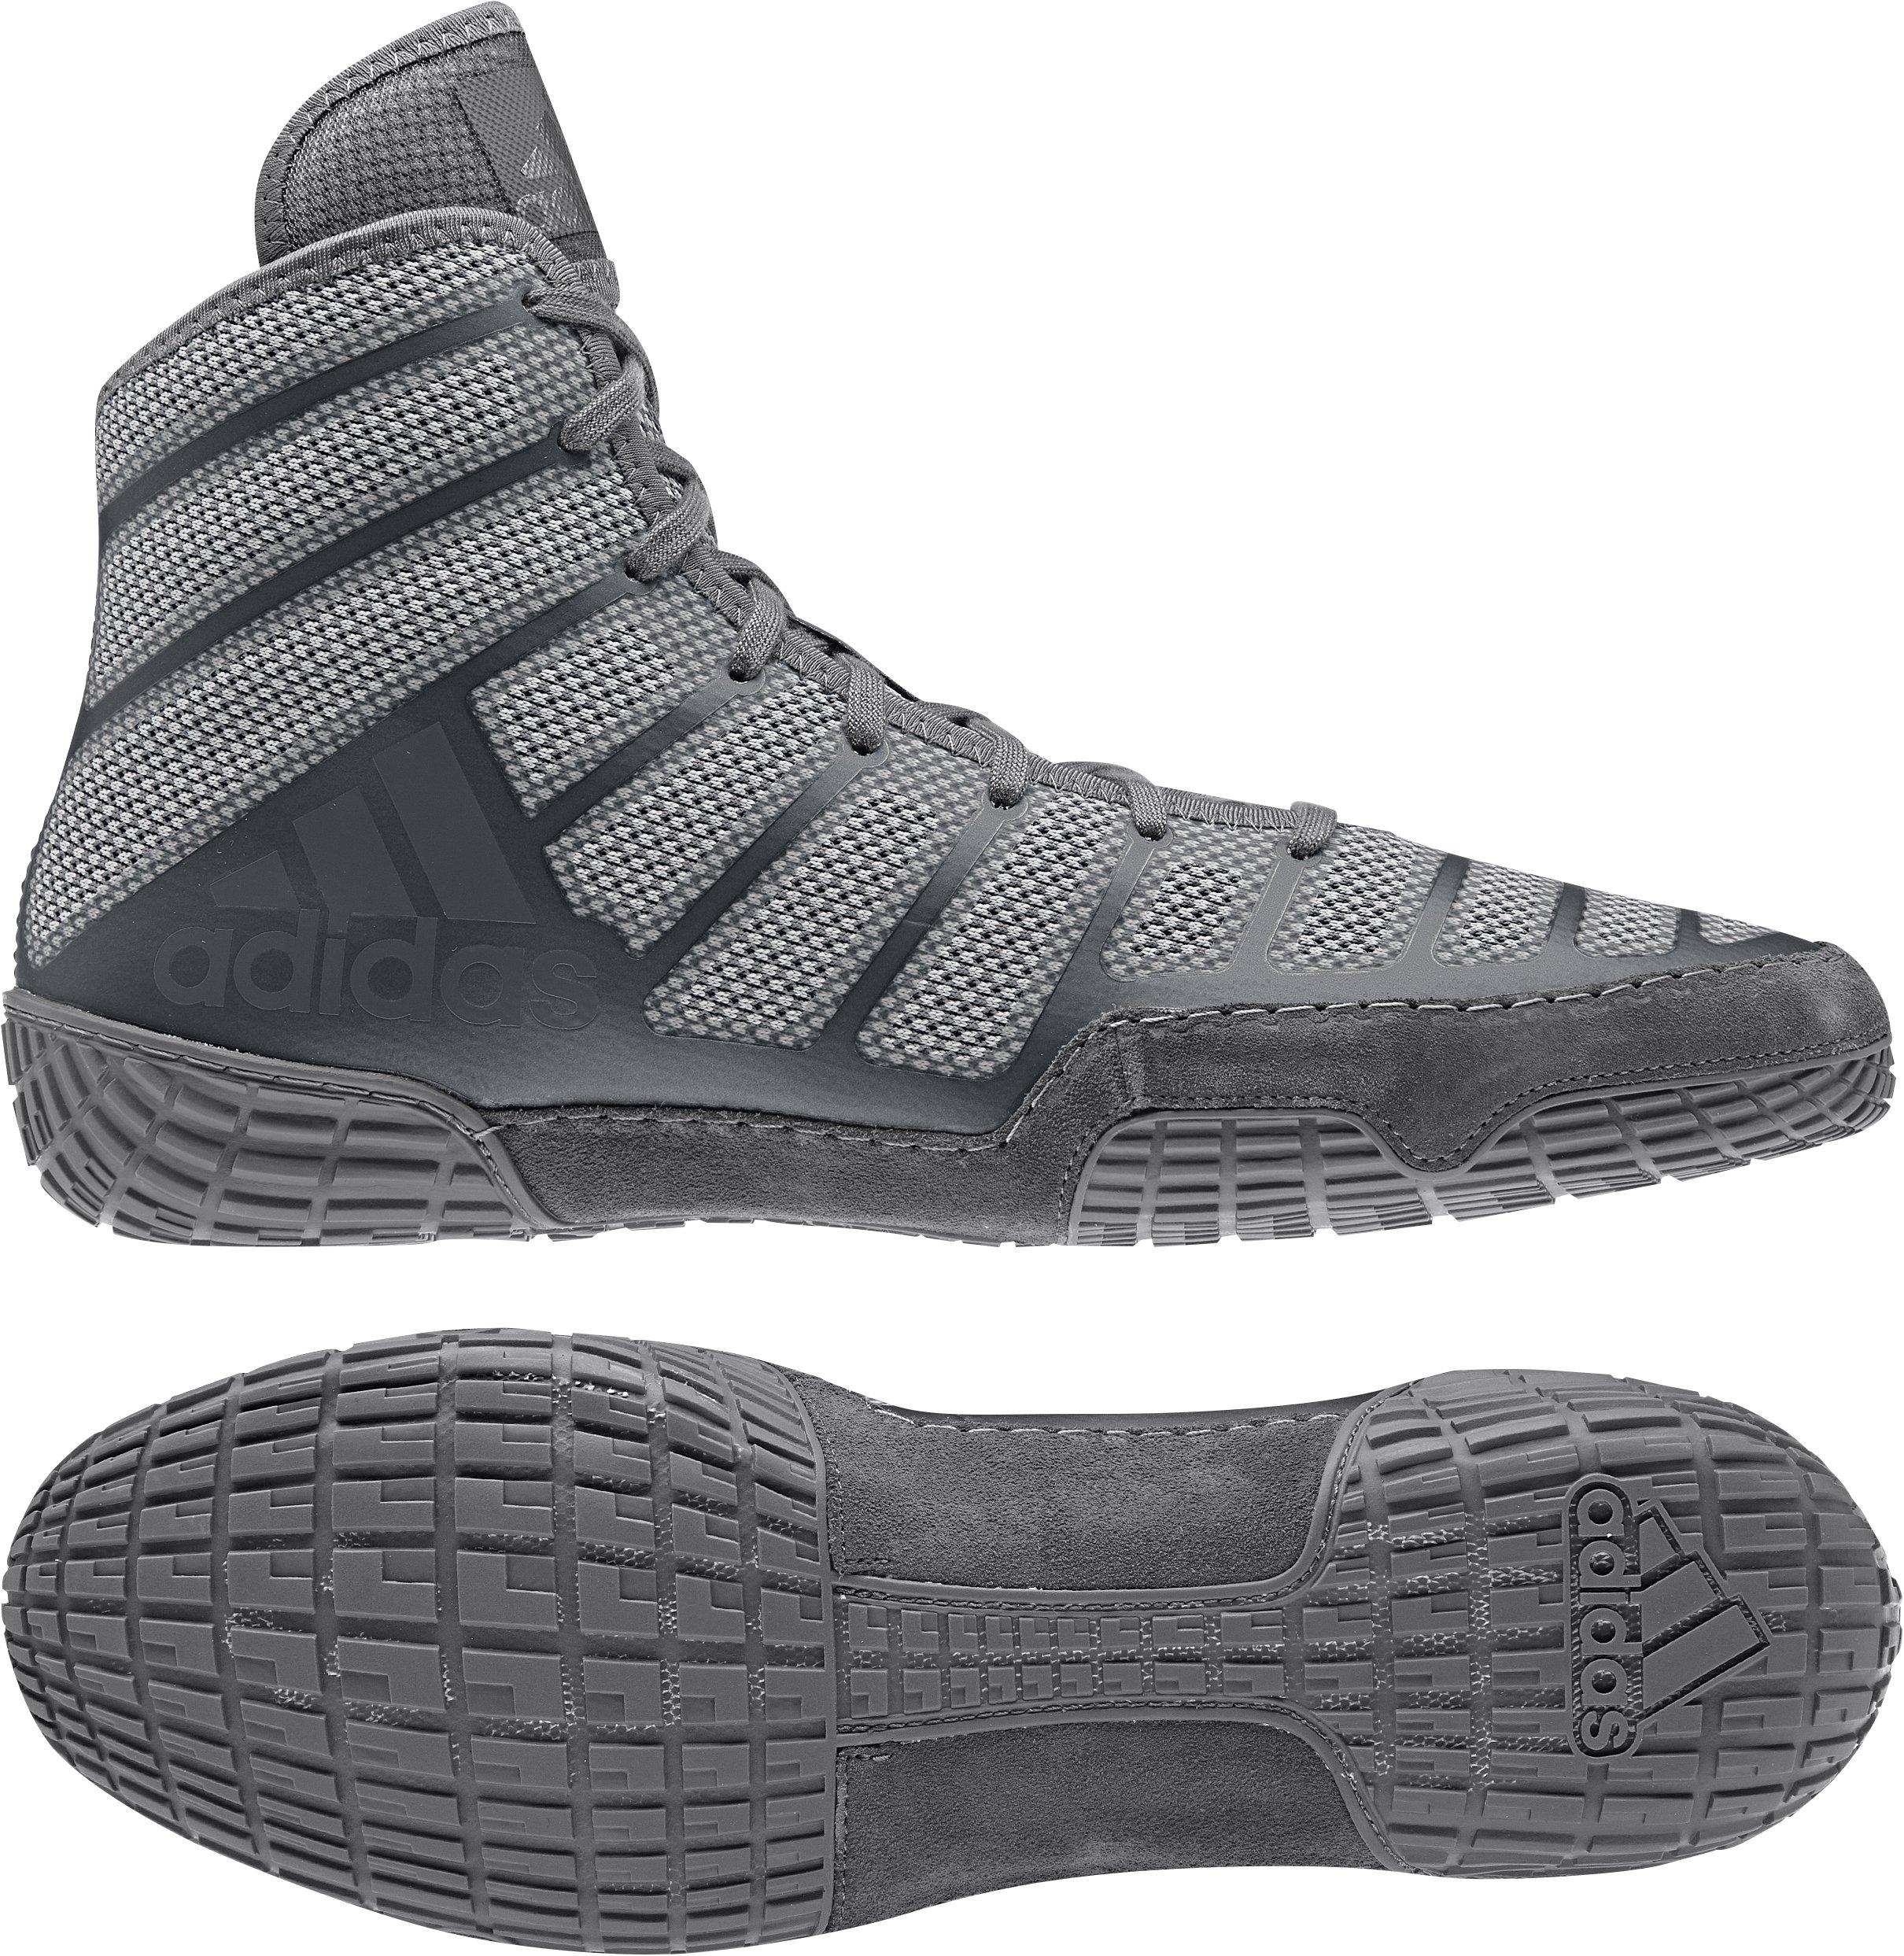 e8aac12bddf Galleon - Adidas Men s Adizero Varner Wrestling Shoes